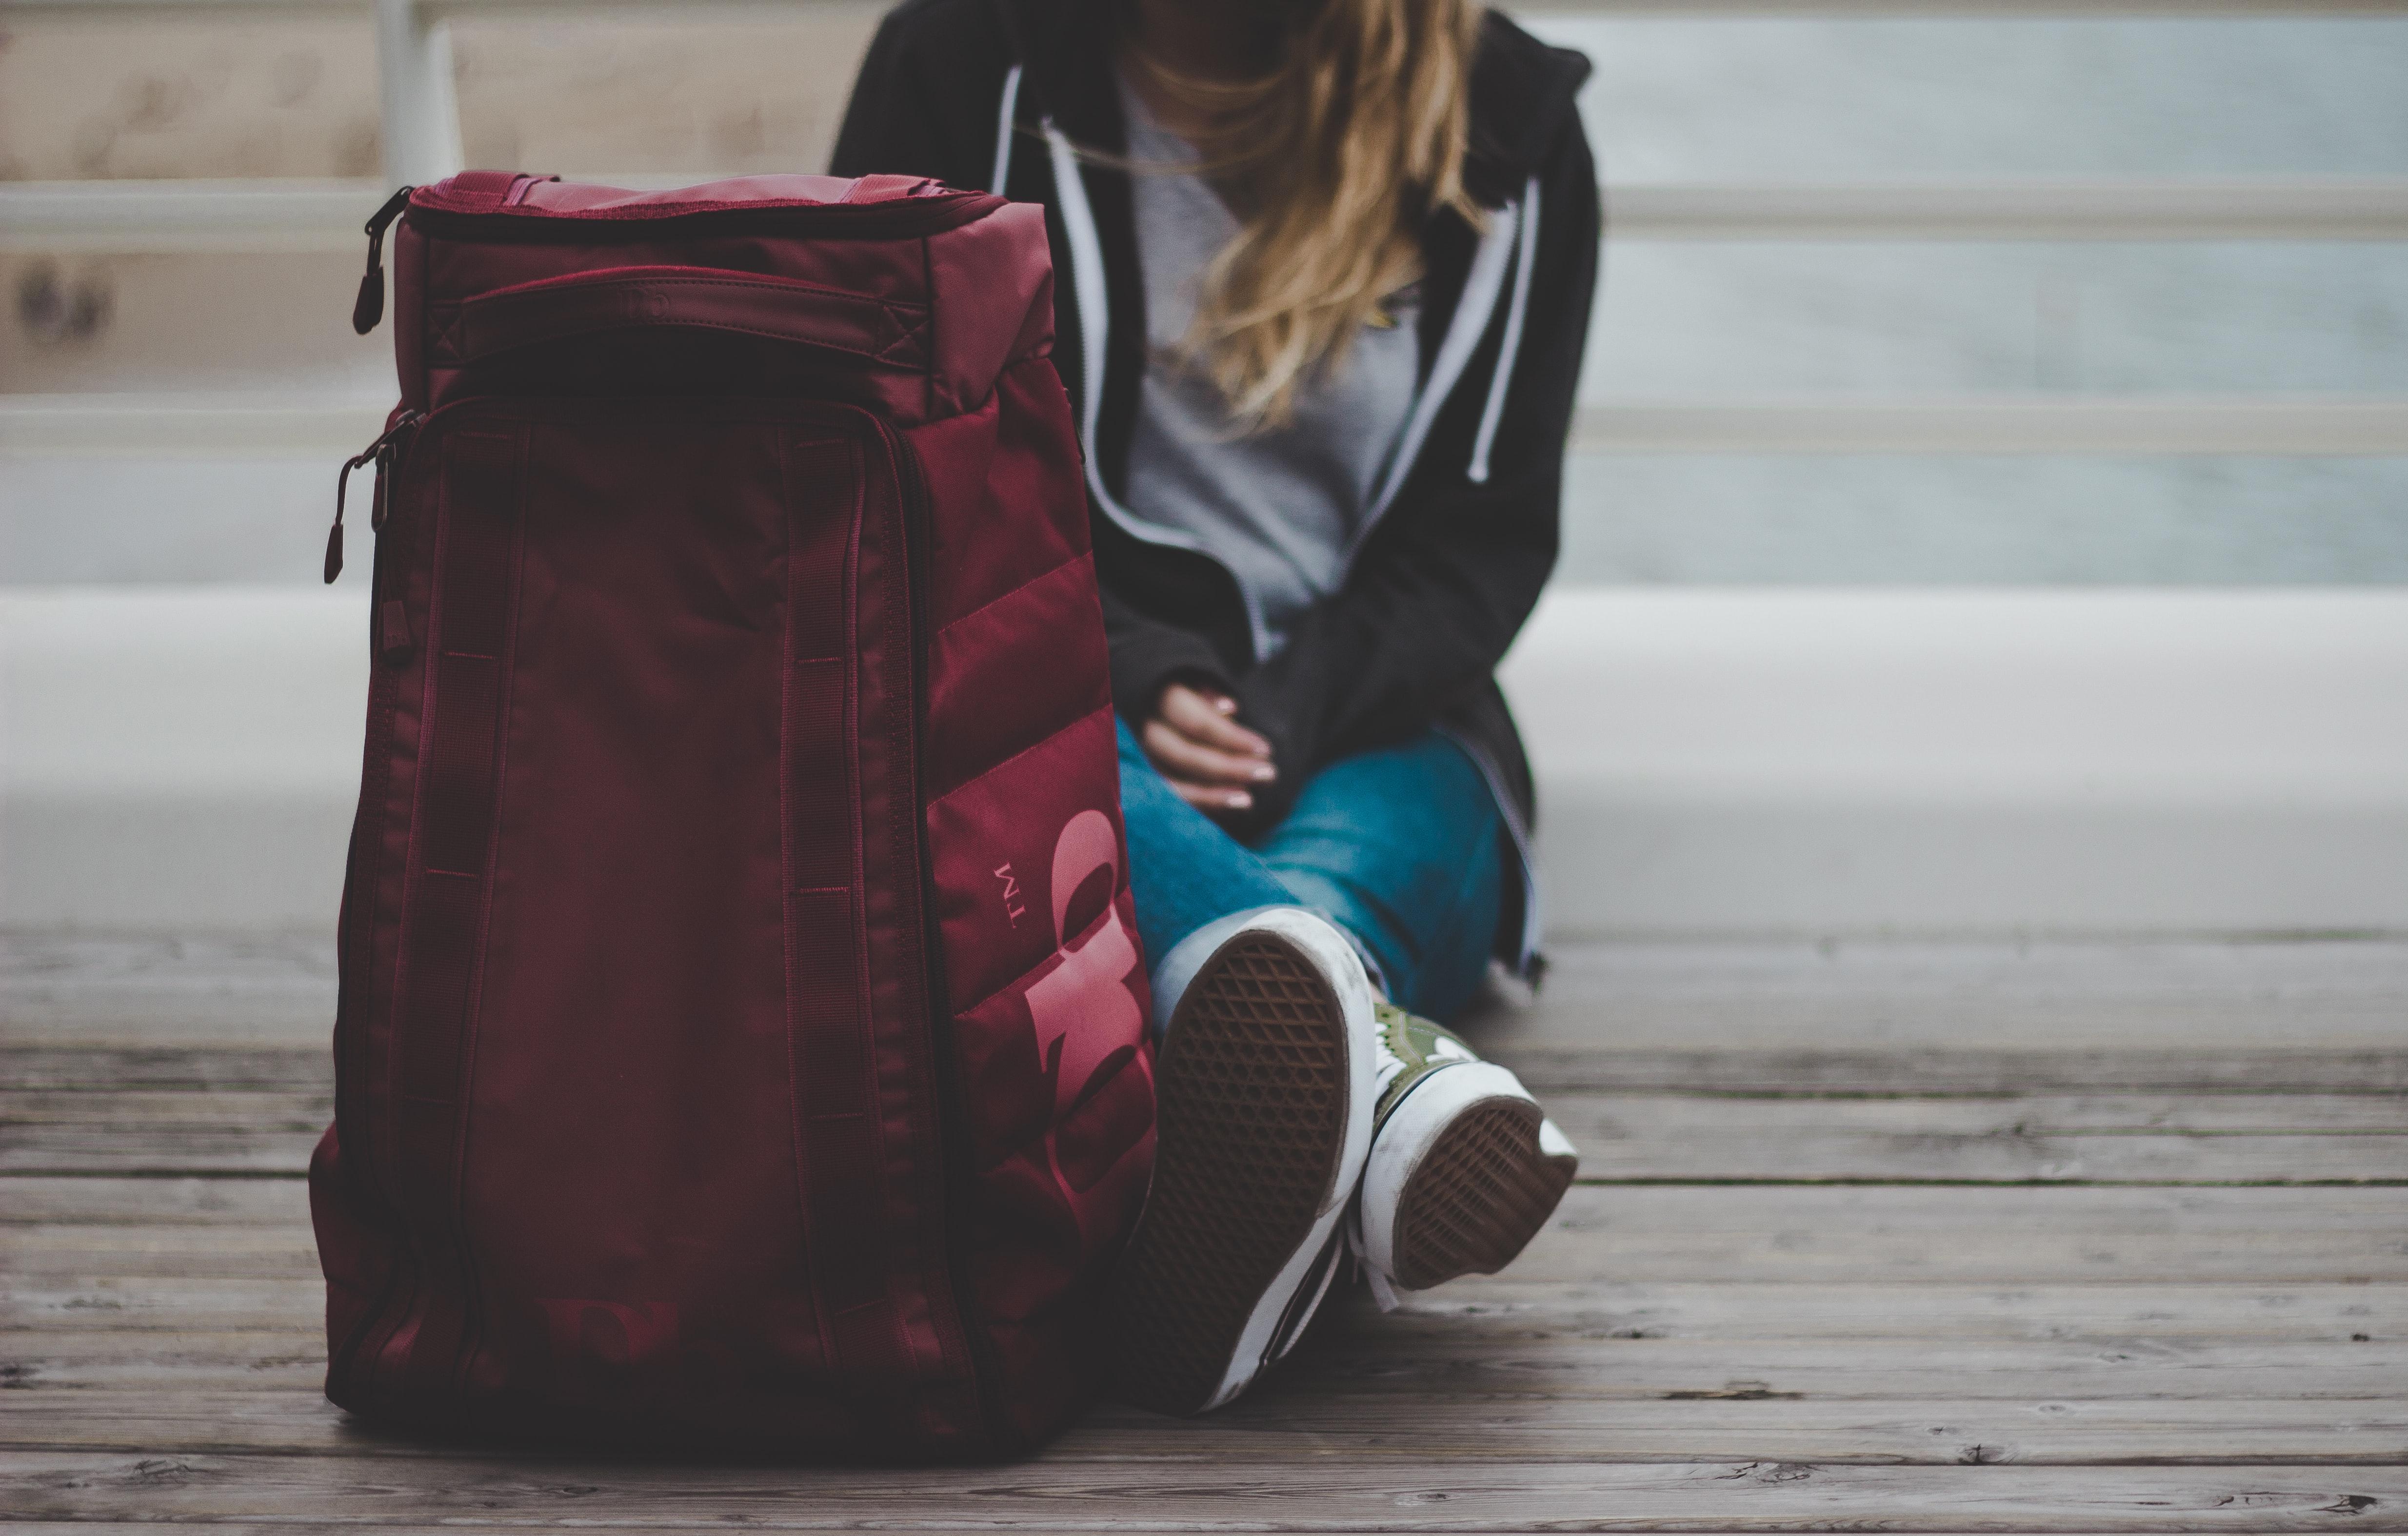 millennials e viaggi: tendenze dei giovanissimi